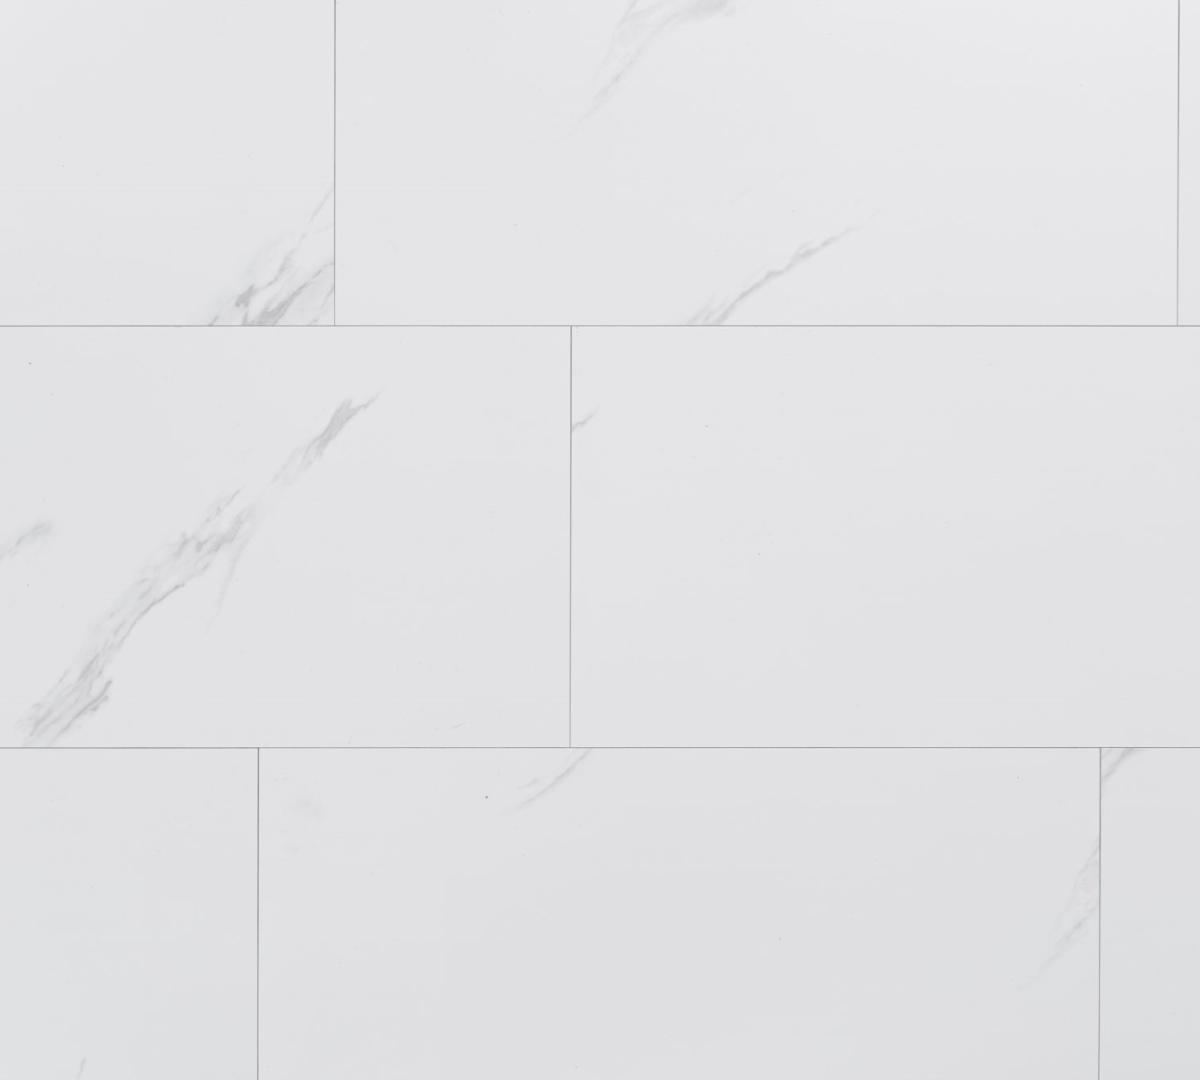 Кварцевый ламинат Aquafloor STONE AF 3531MST (610*305*3,5 мм) 10шт/1,86м2